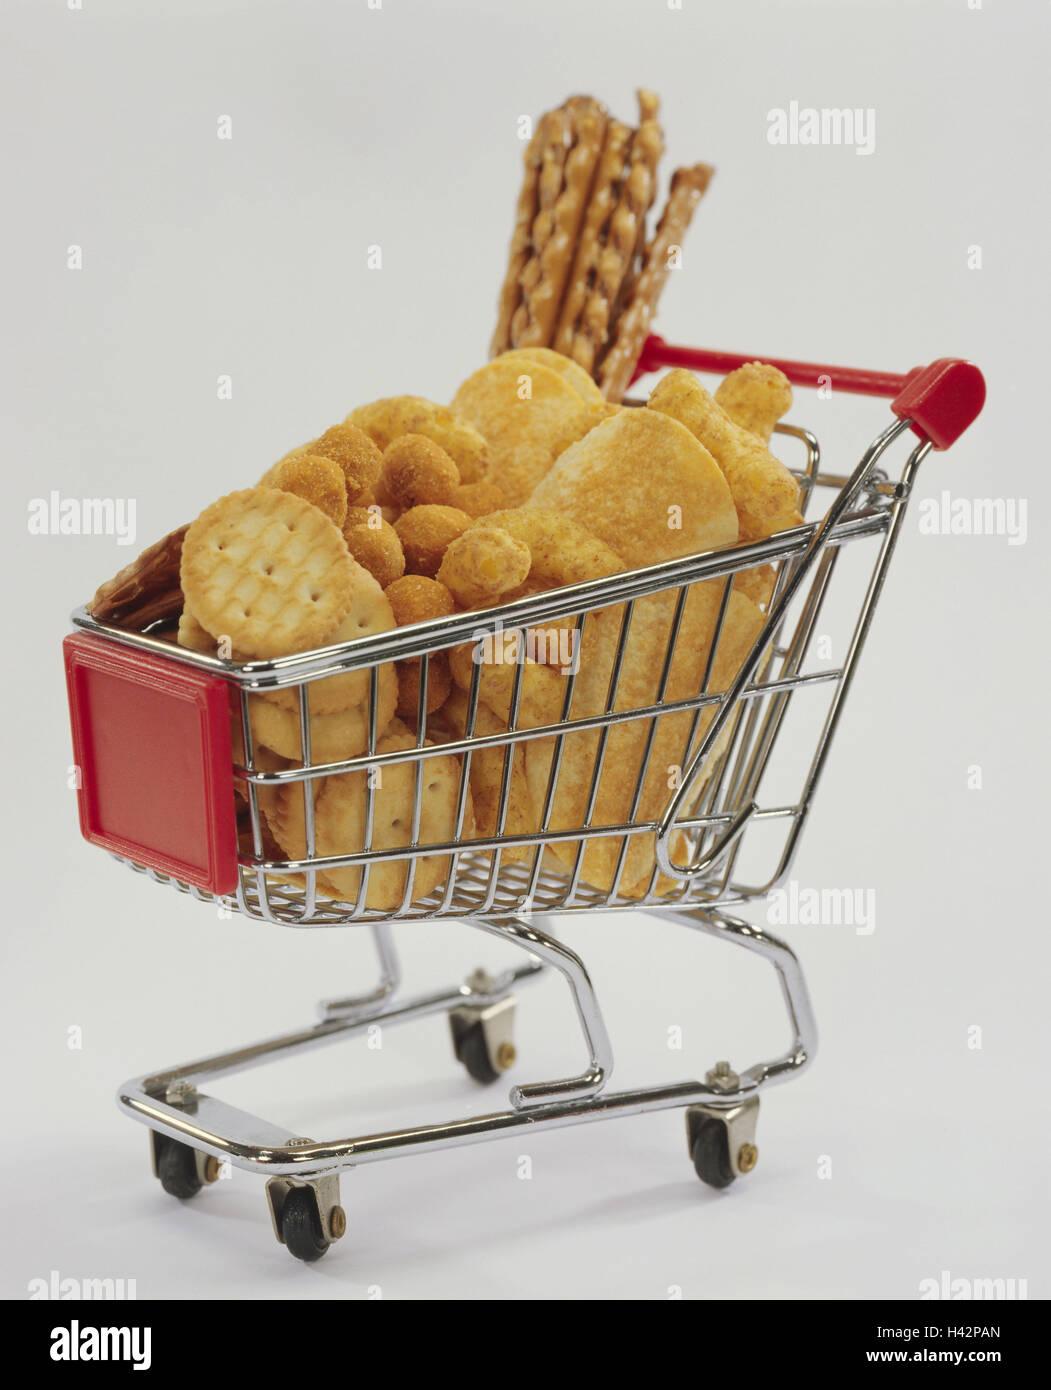 Shoppen, Karren, Miniatur, herzhafte Snacks, Kuchen, Grissini, Einkaufen, Knabbermischung, Salzstangerl, Ernährung, Stockbild